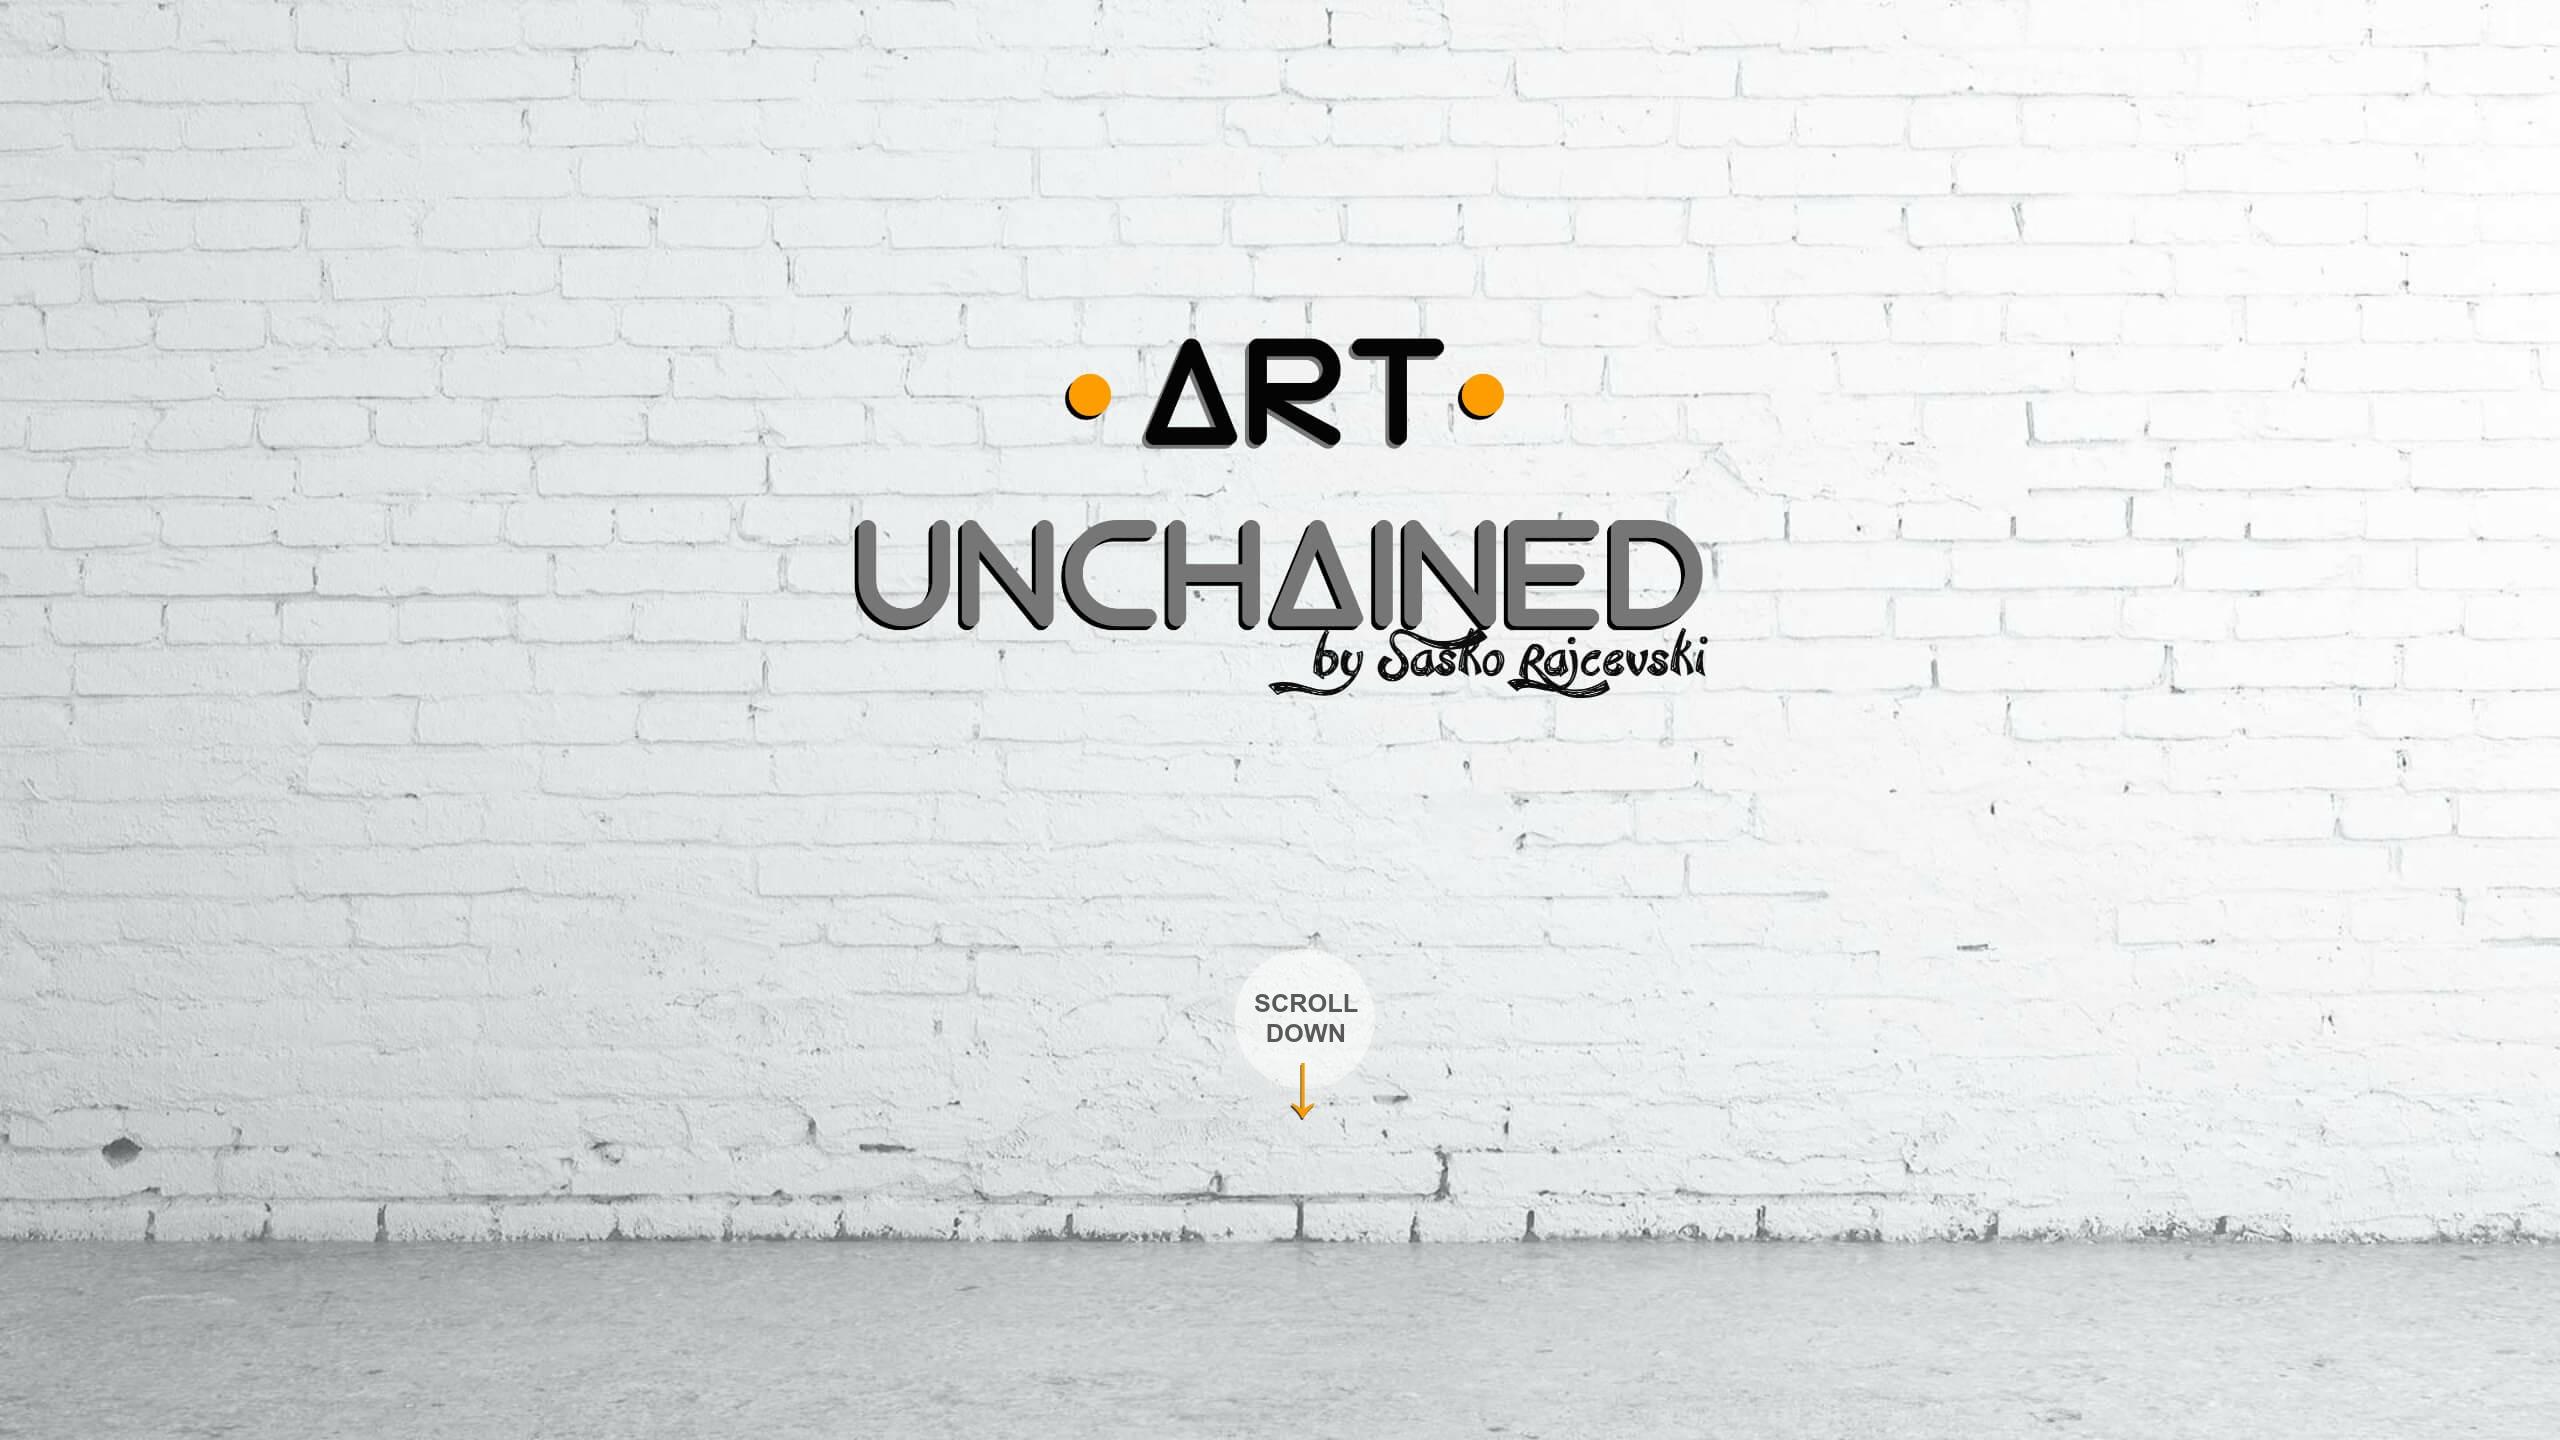 Art Unchained - Entfesselte Kunst by Sasko Rajcevki Homepage large 2560 Centered middle arrowArt Unchained - Entfesselte Kunst by Sasko Rajcevki Homepage large 2560 Centered middle arrow